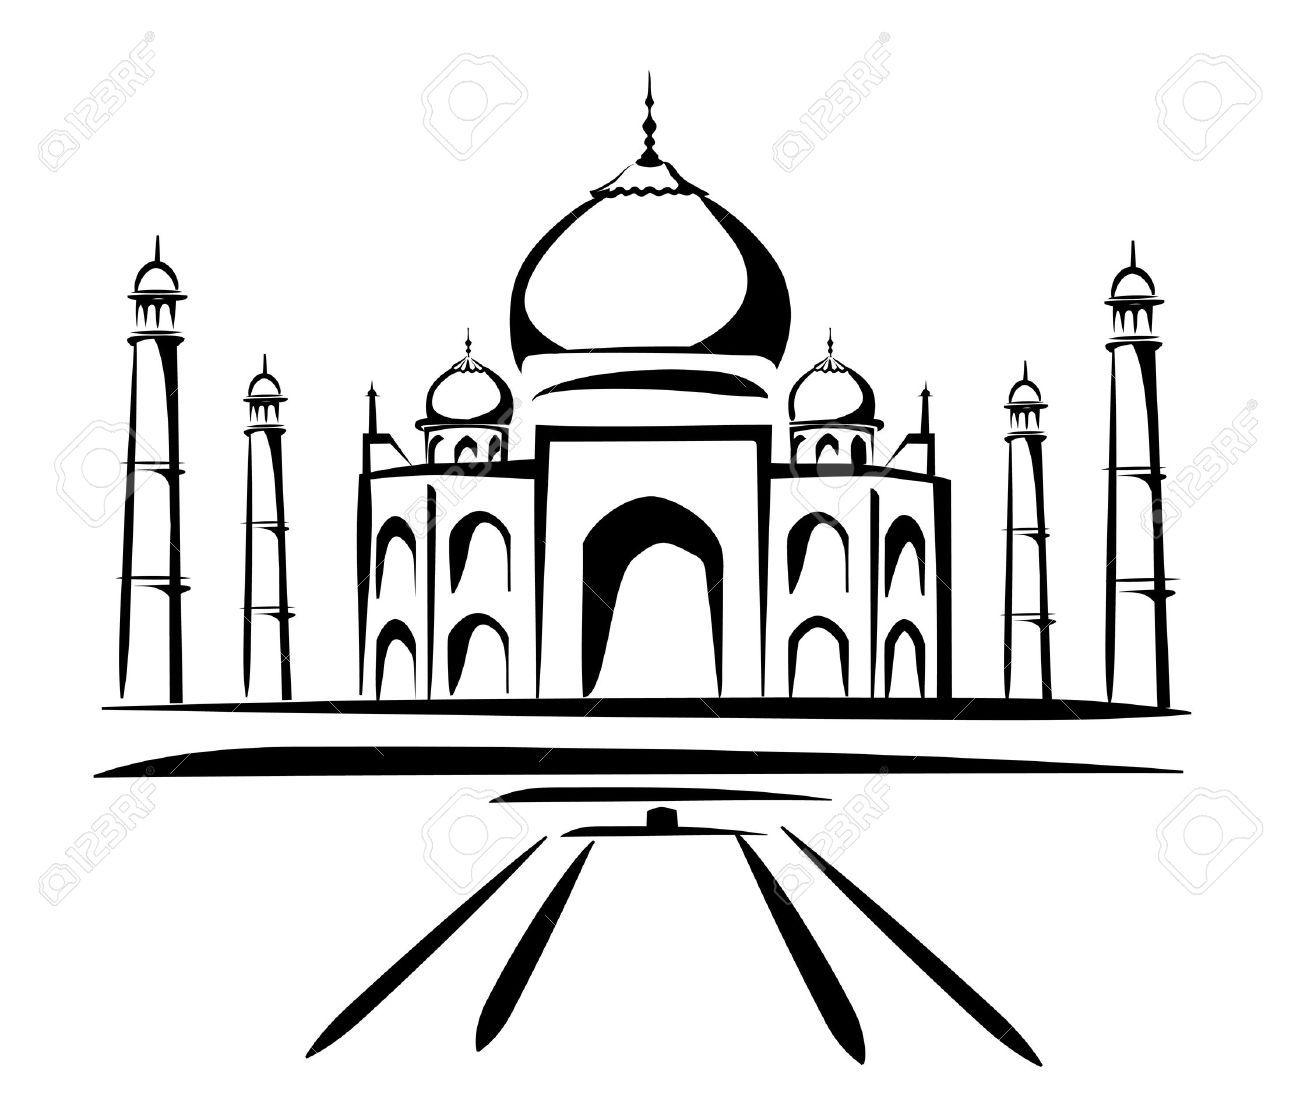 Taj mahal clipart png royalty free library Taj mahal clipart 6 » Clipart Portal png royalty free library